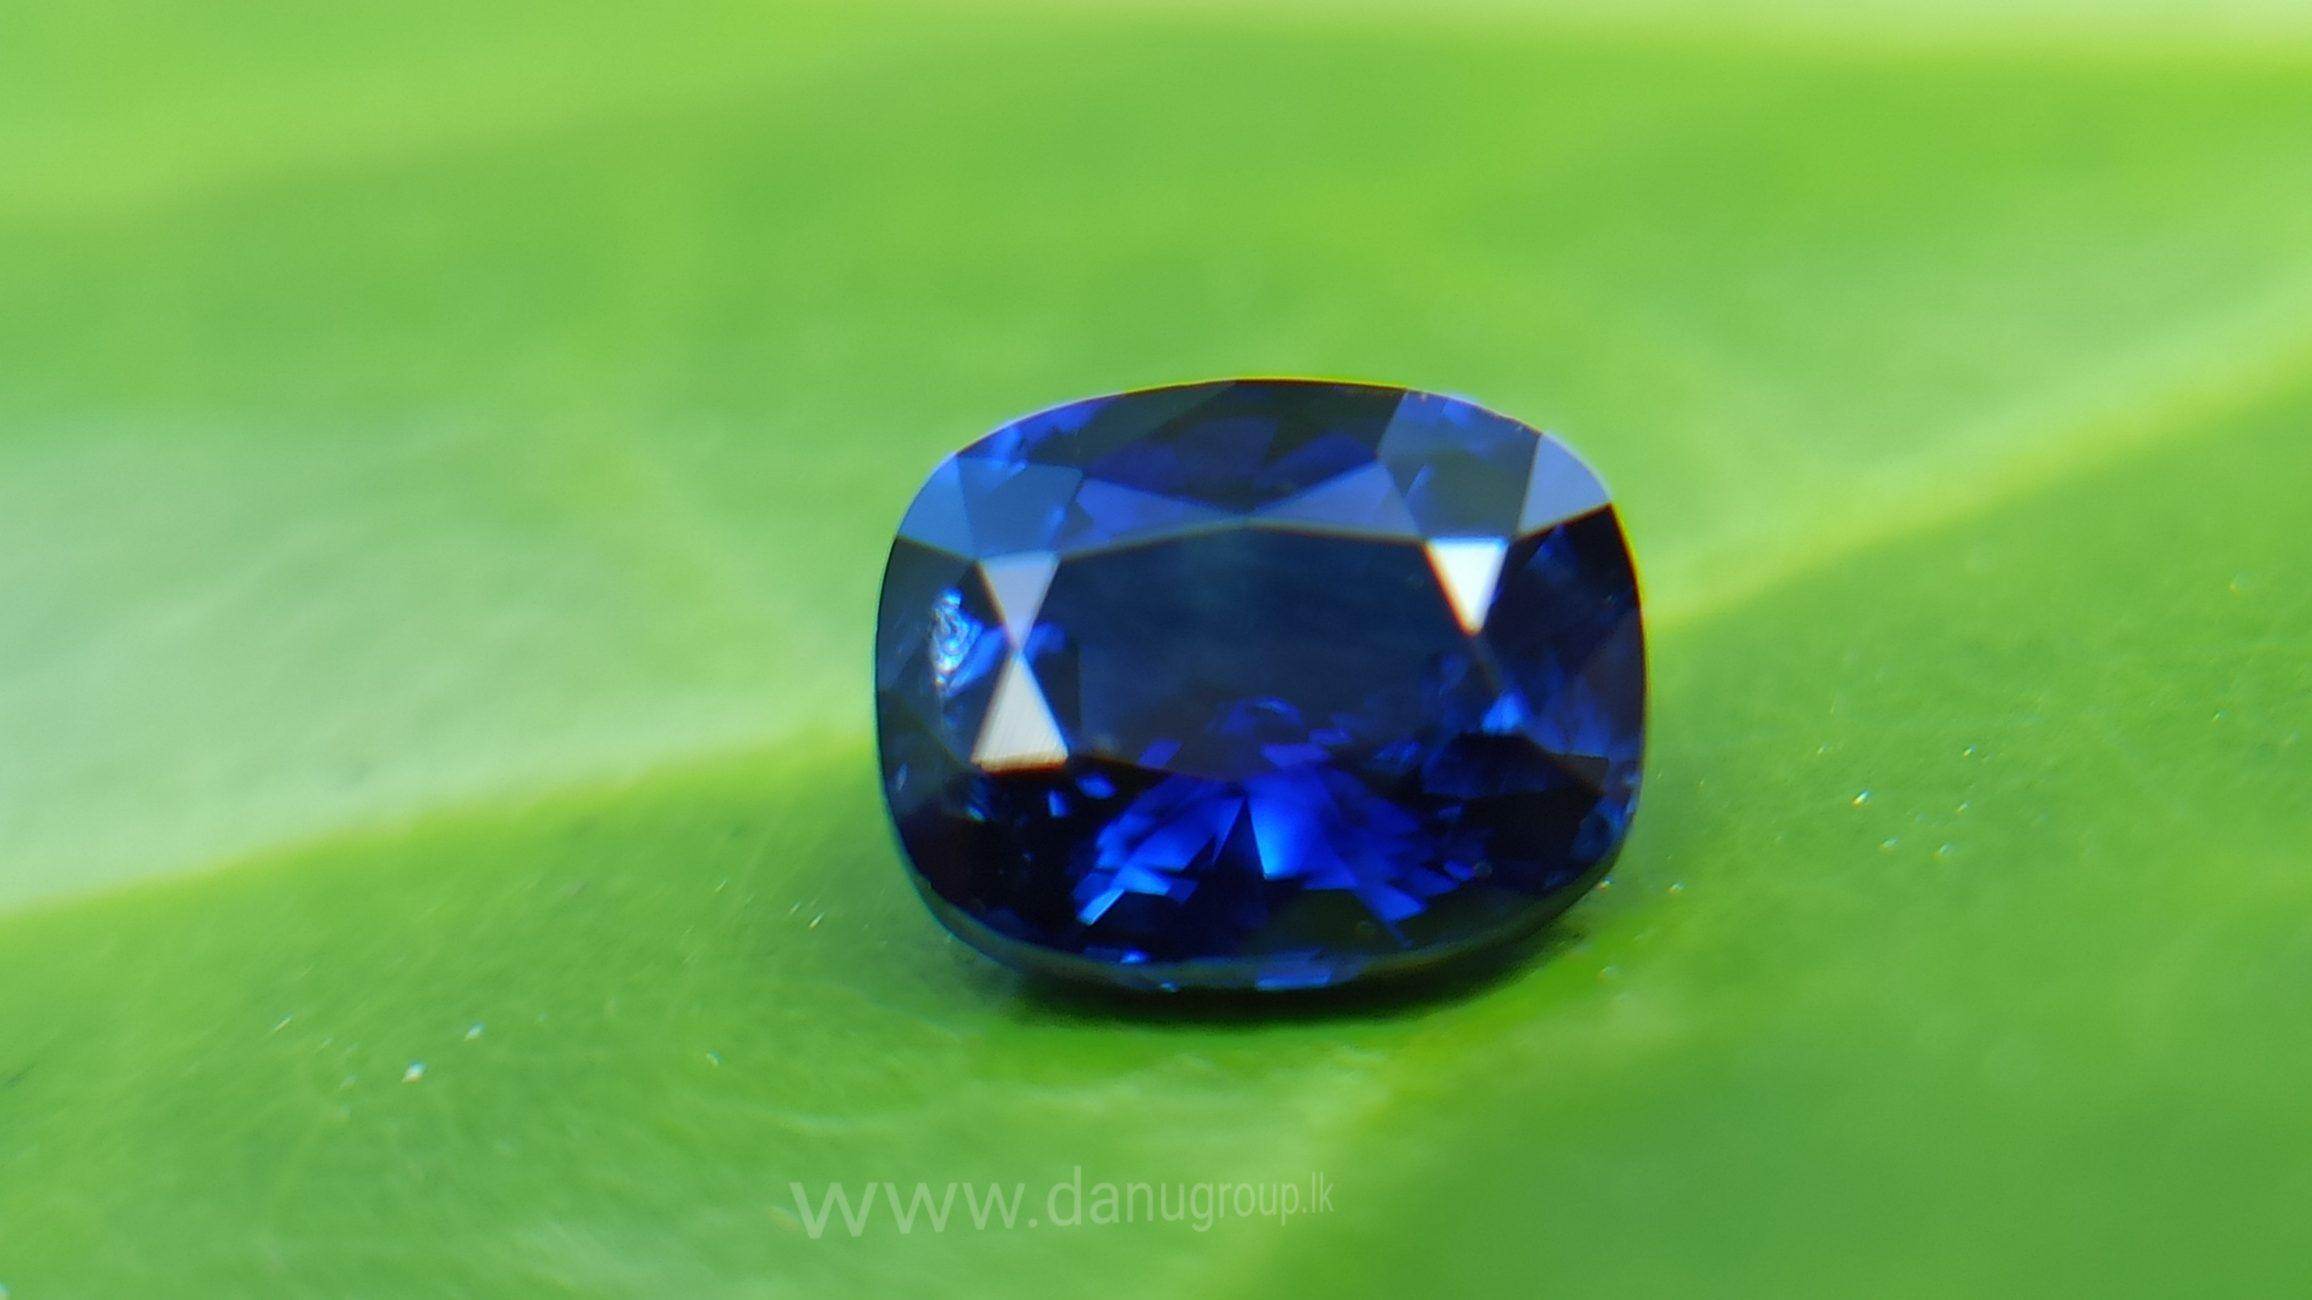 Natural Vivid Royal Blue Sapphire Danu Group Royal Gemstones